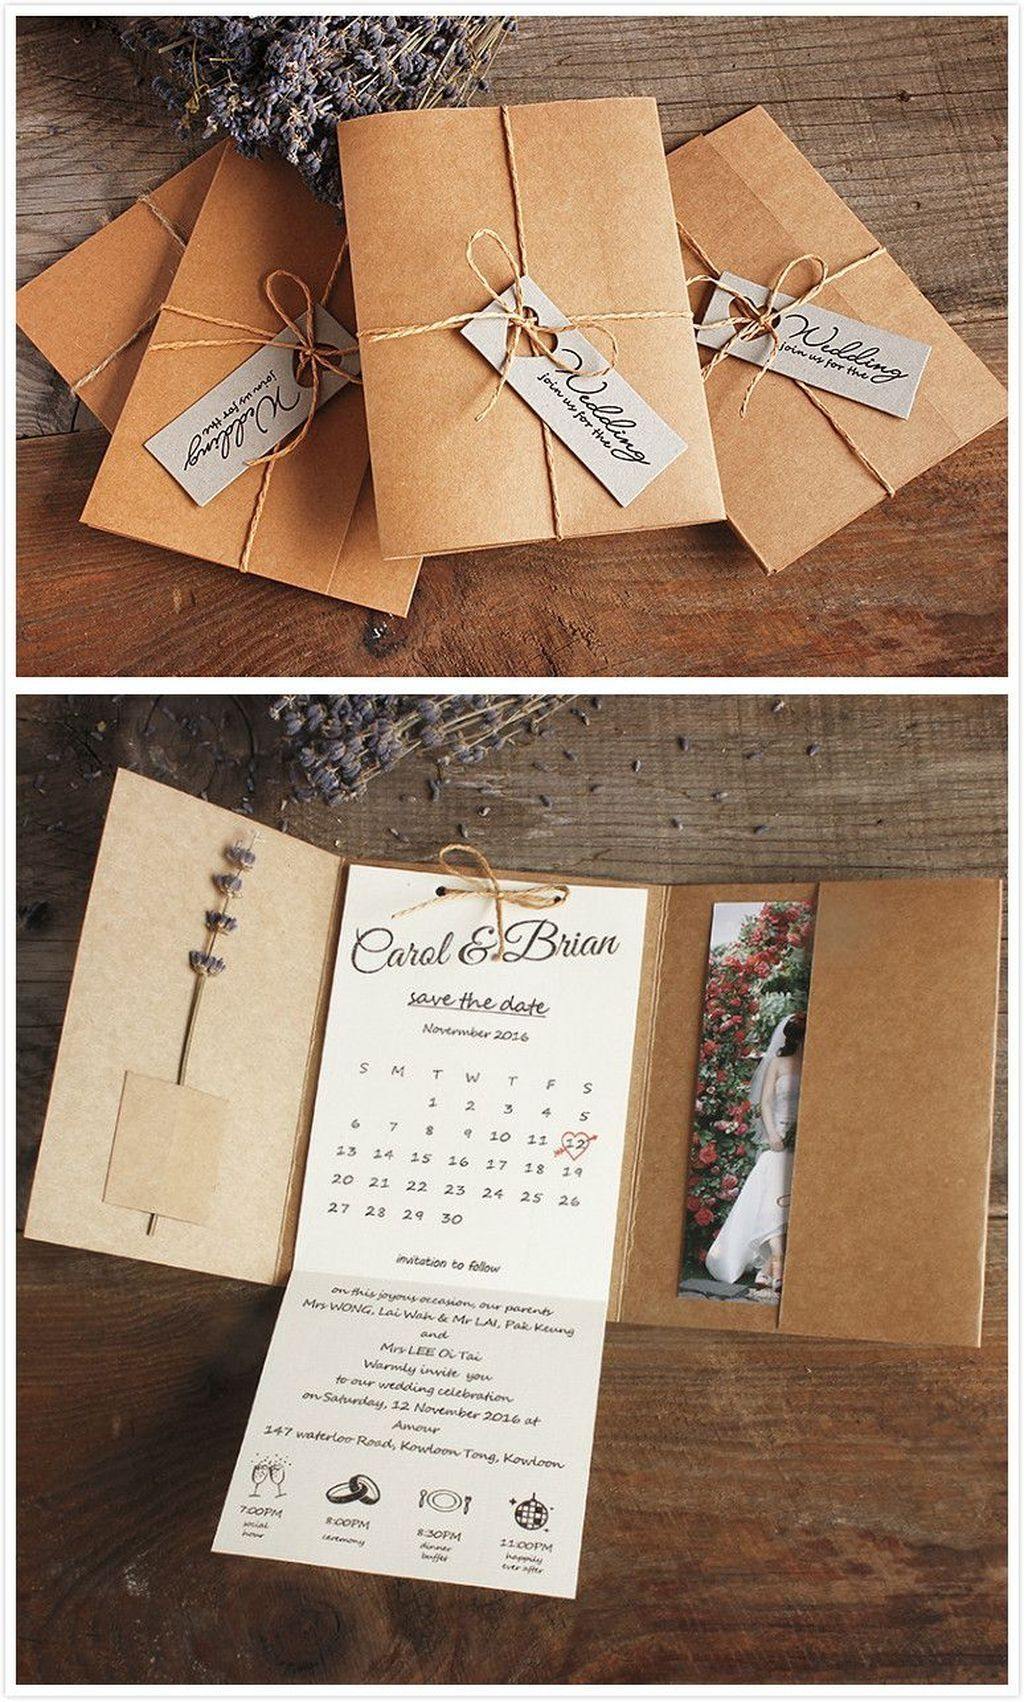 30 Awesome Wedding Invitations Ideas Pocket Wedding Invitations Wedding Invitations Rustic Handmade Wedding Invitations